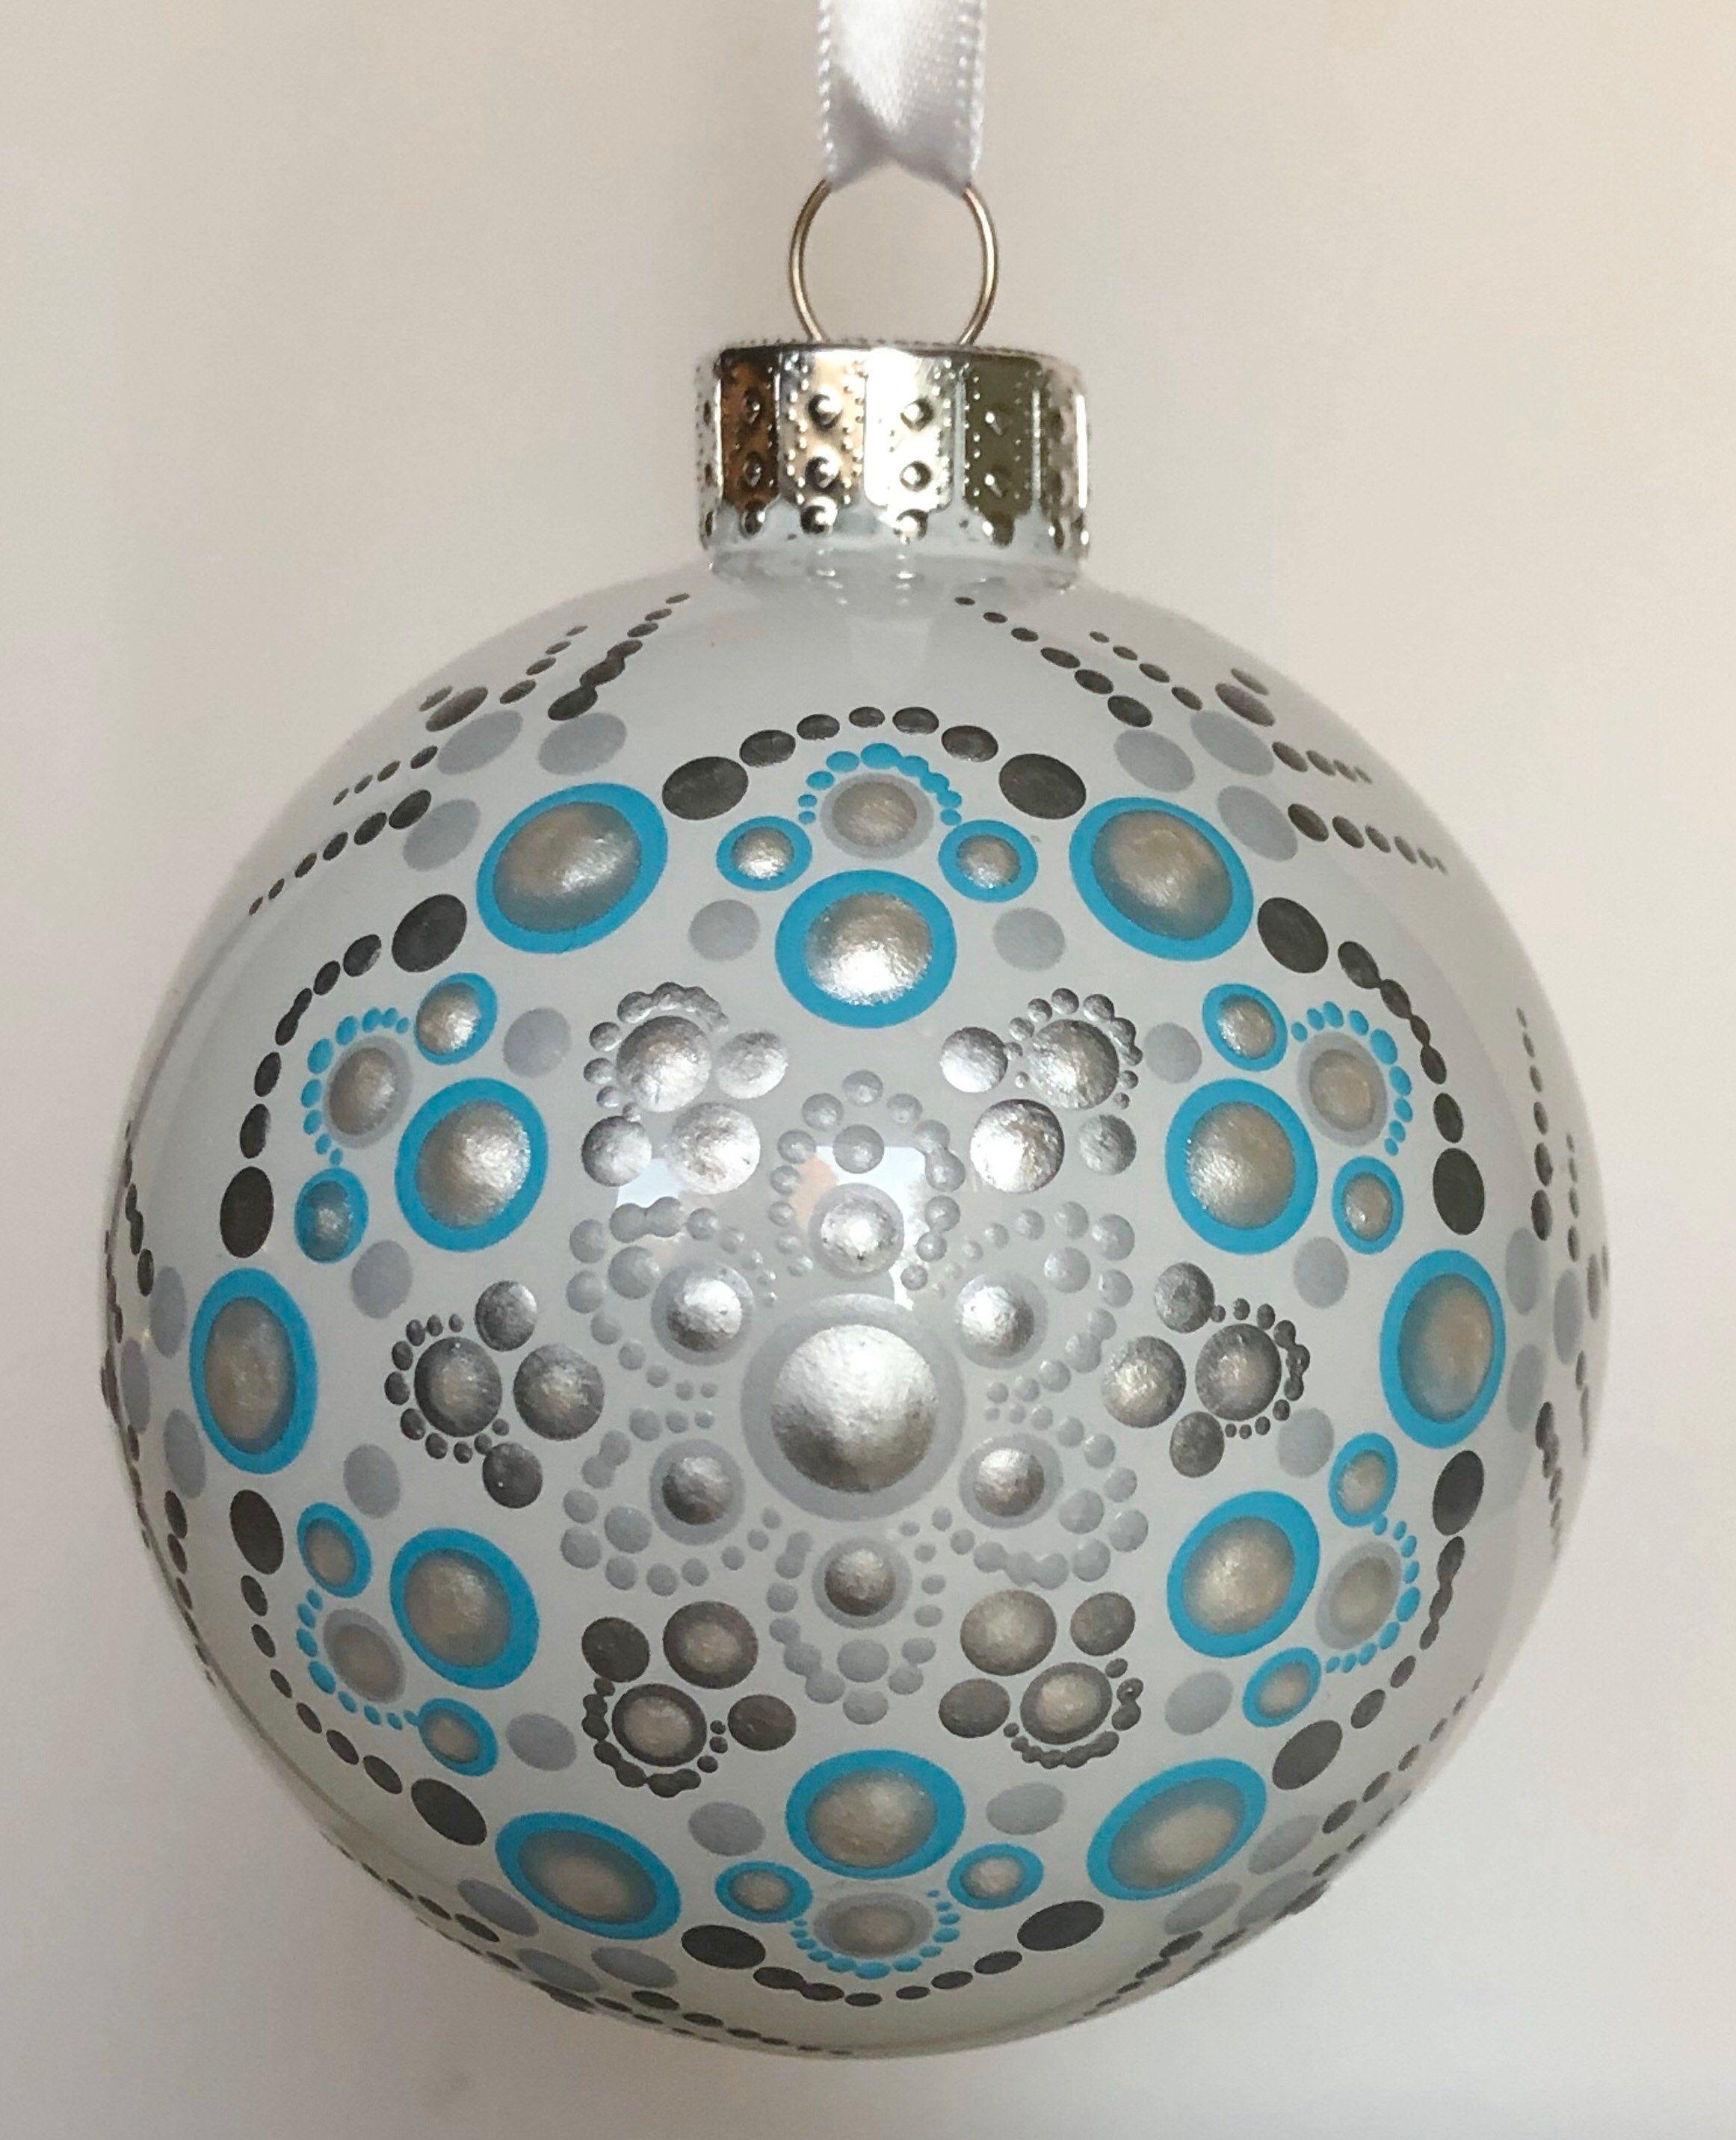 Snowflake Dot Mandala On White Glass Ball Ornament 3 1 Glass Ball Ornaments Painted Christmas Ornaments Christmas Mandala